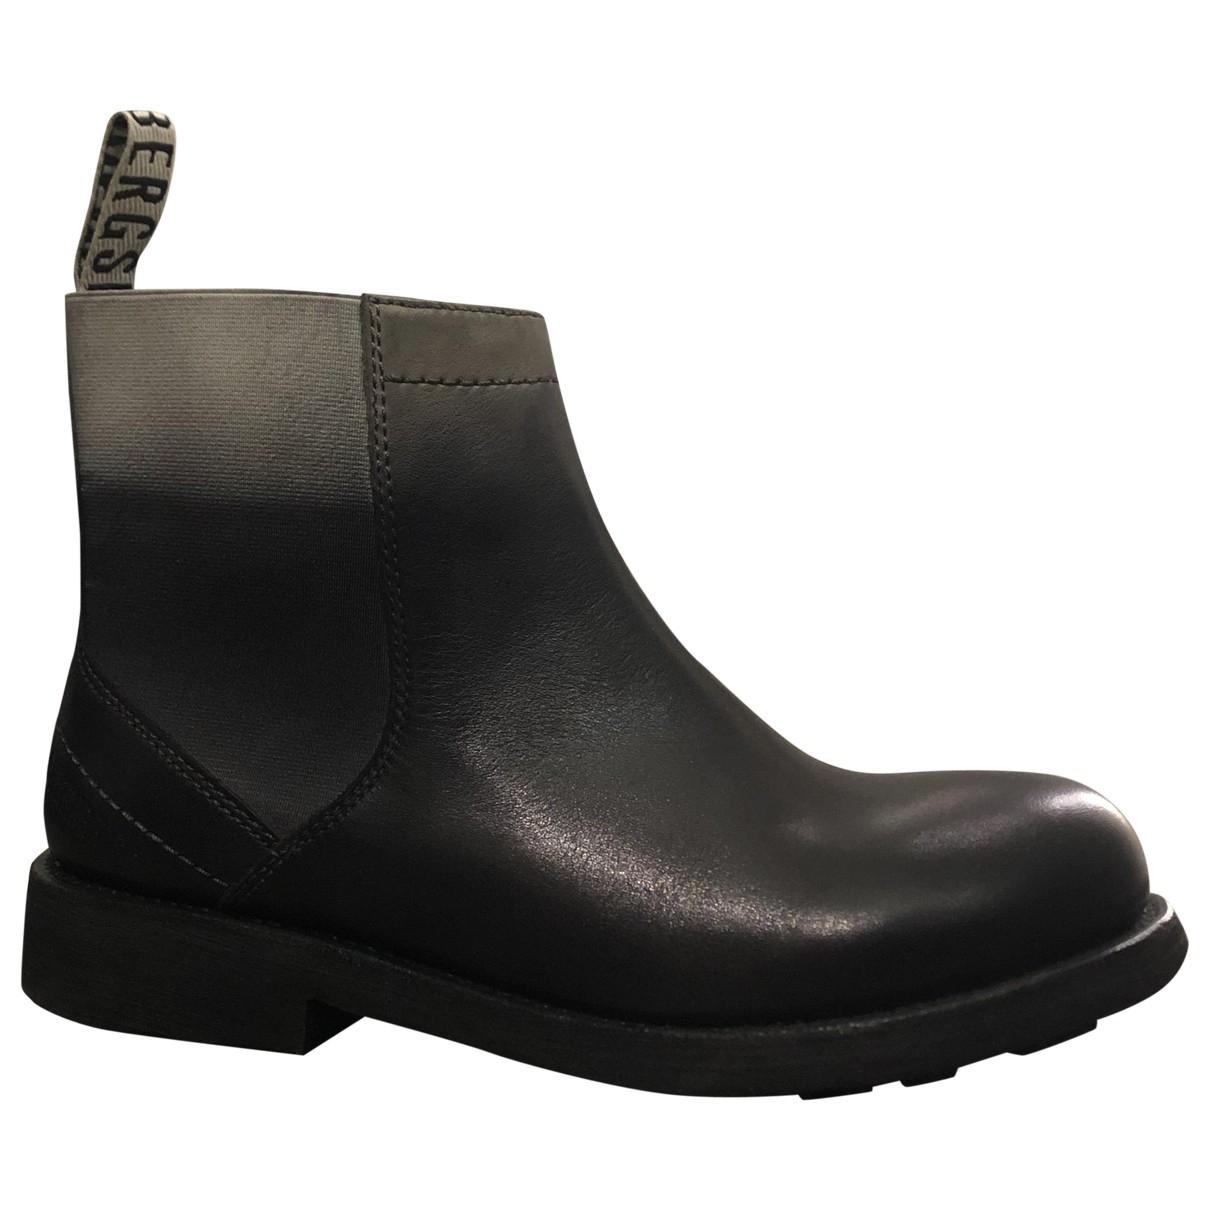 Dirk Bikkembergs - Boots   pour femme en cuir - noir